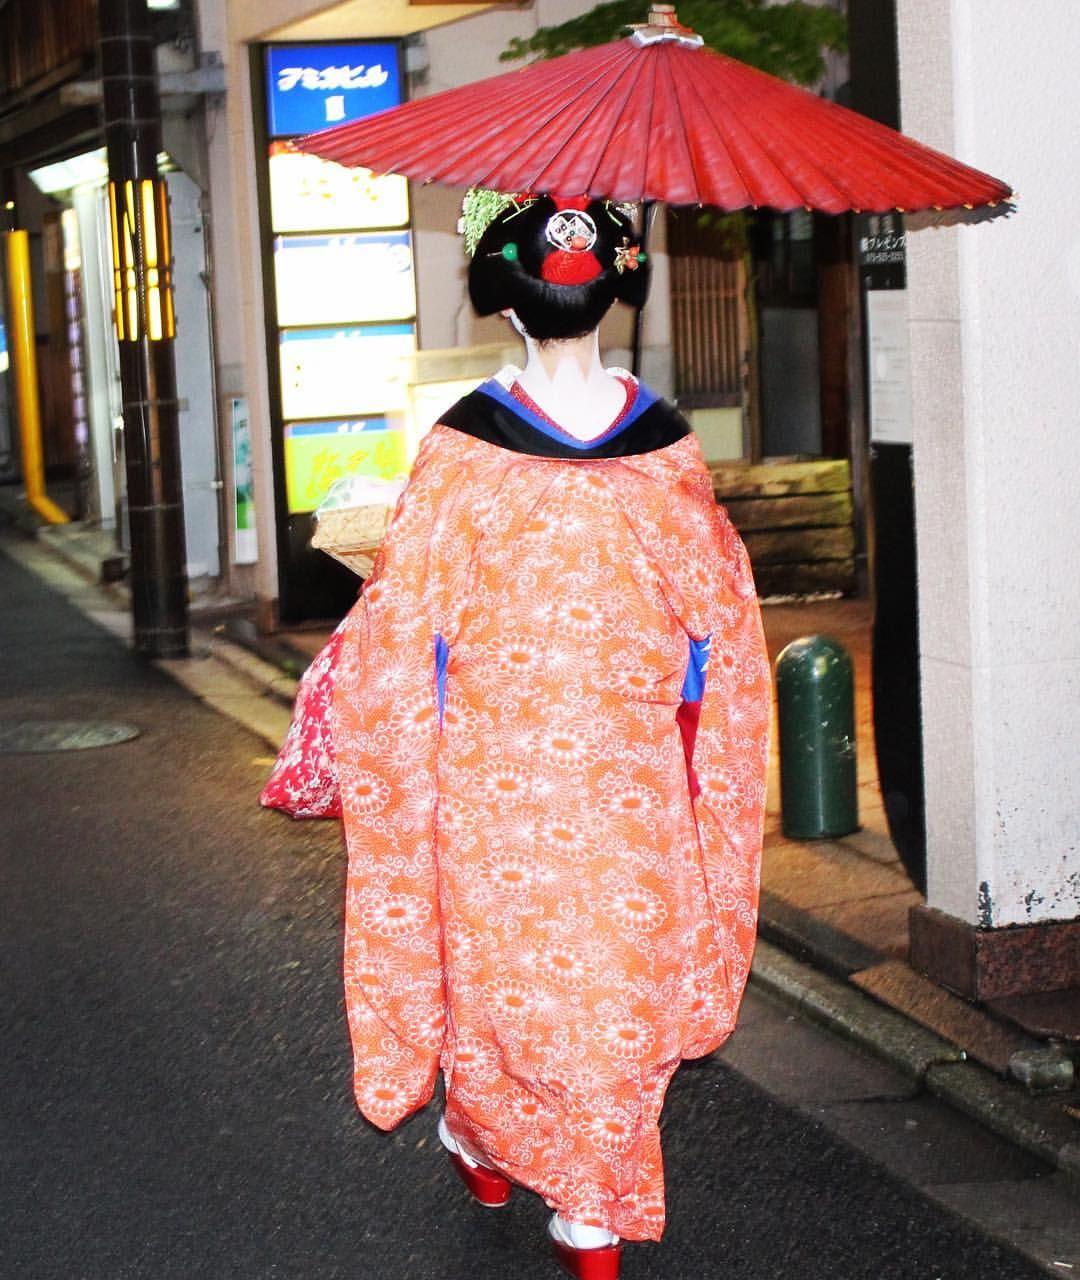 Pelo bairro de Gion, uma surpresa 😍🇯🇵 Kyoto- Japan #gueixa #kyoto #quioto #japao #japan #viagem #summer2016 #happy #gion #travel #traveling #fashionblogger #lifestyle #viajar #asia #asiatravel #kimono #vacation #vacaciones #ferias #viajarepreciso #sonho #amor #amo #life #instatraveling